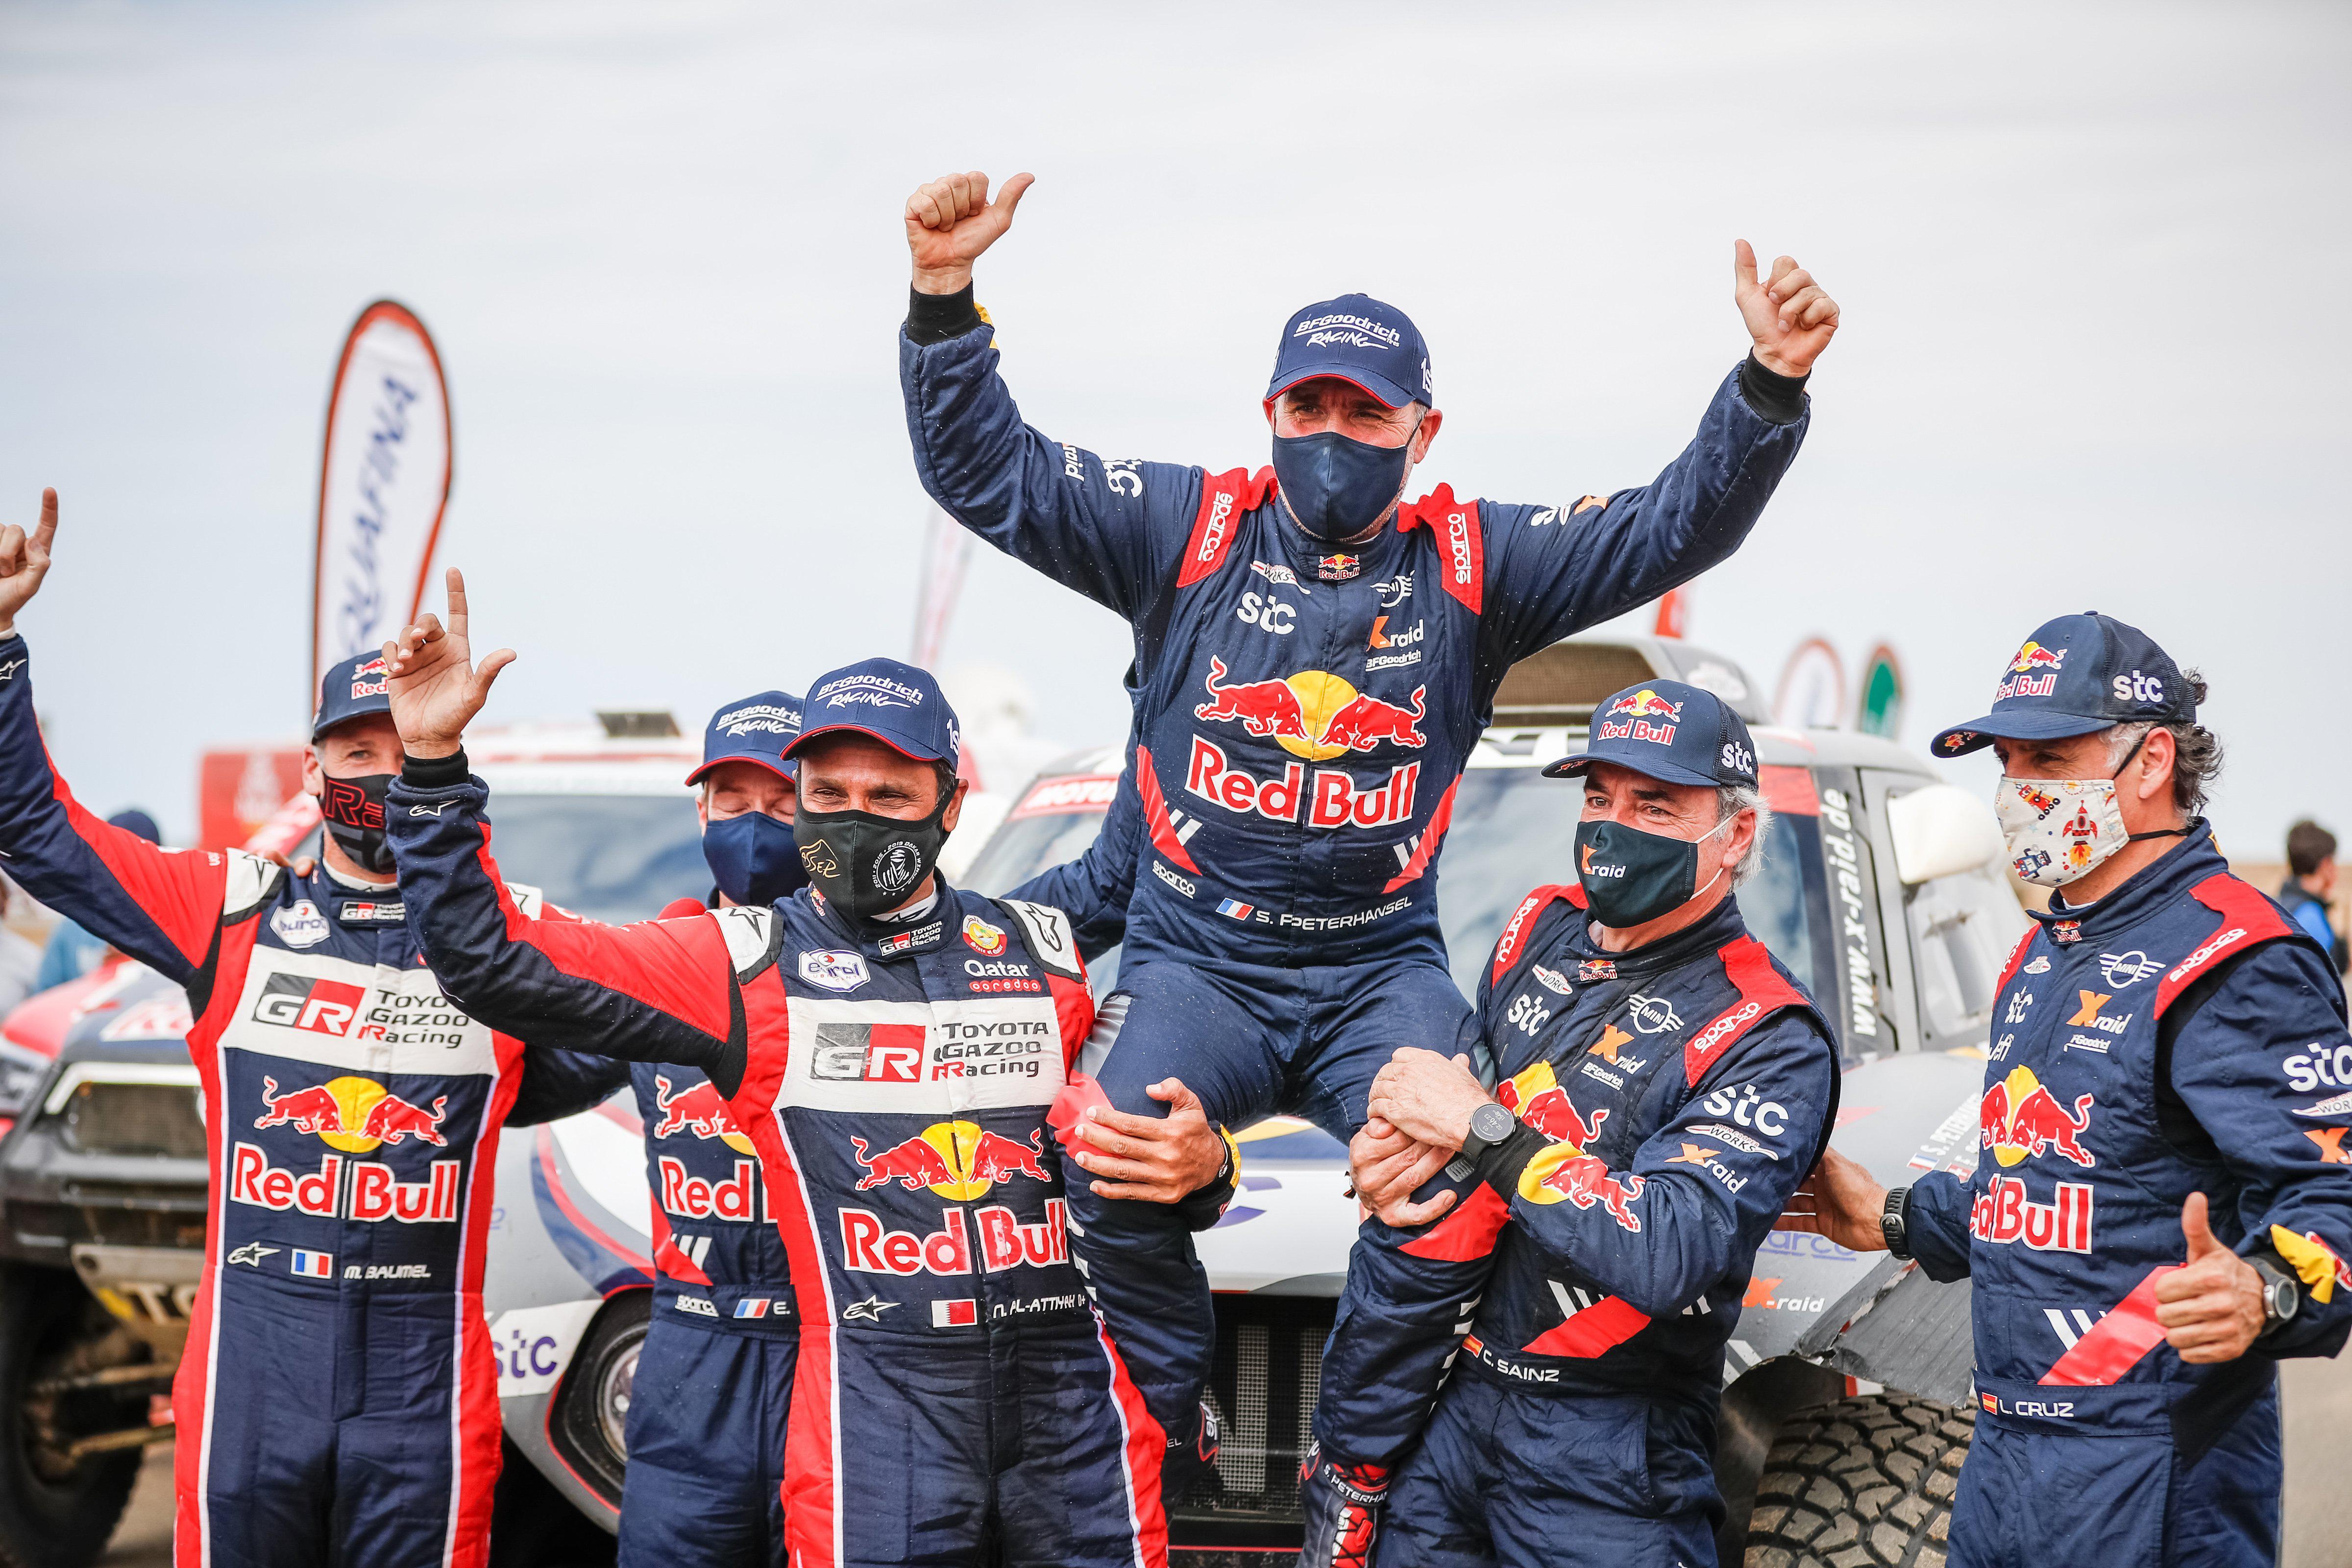 rally-dakar-2021-6eme-victoire-au-general-pour-mini-1416-10.jpg